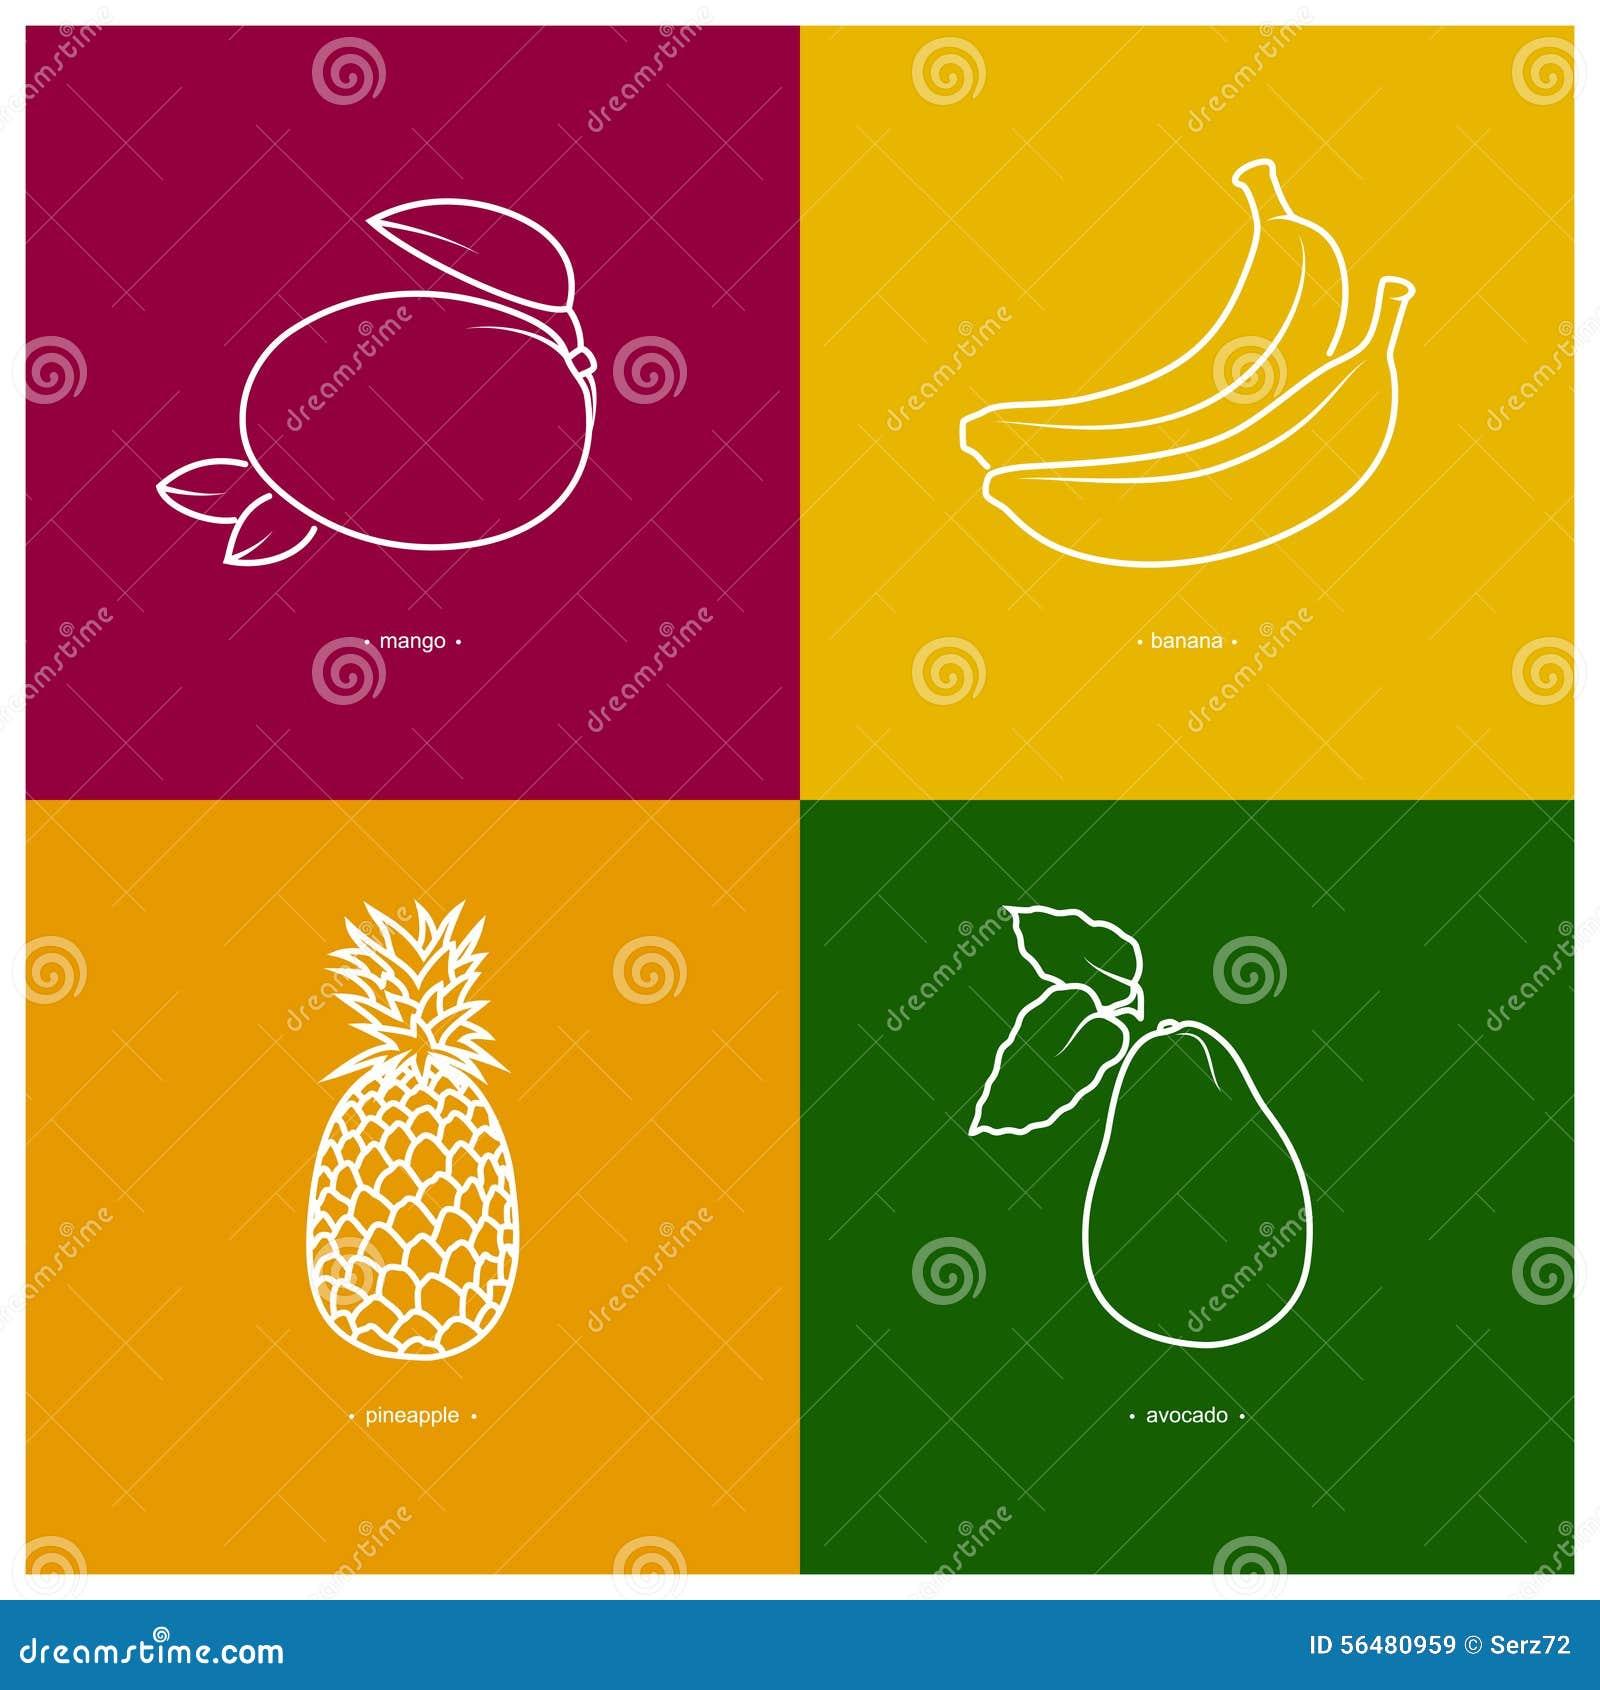 Mangue, banane, ananas, avocat